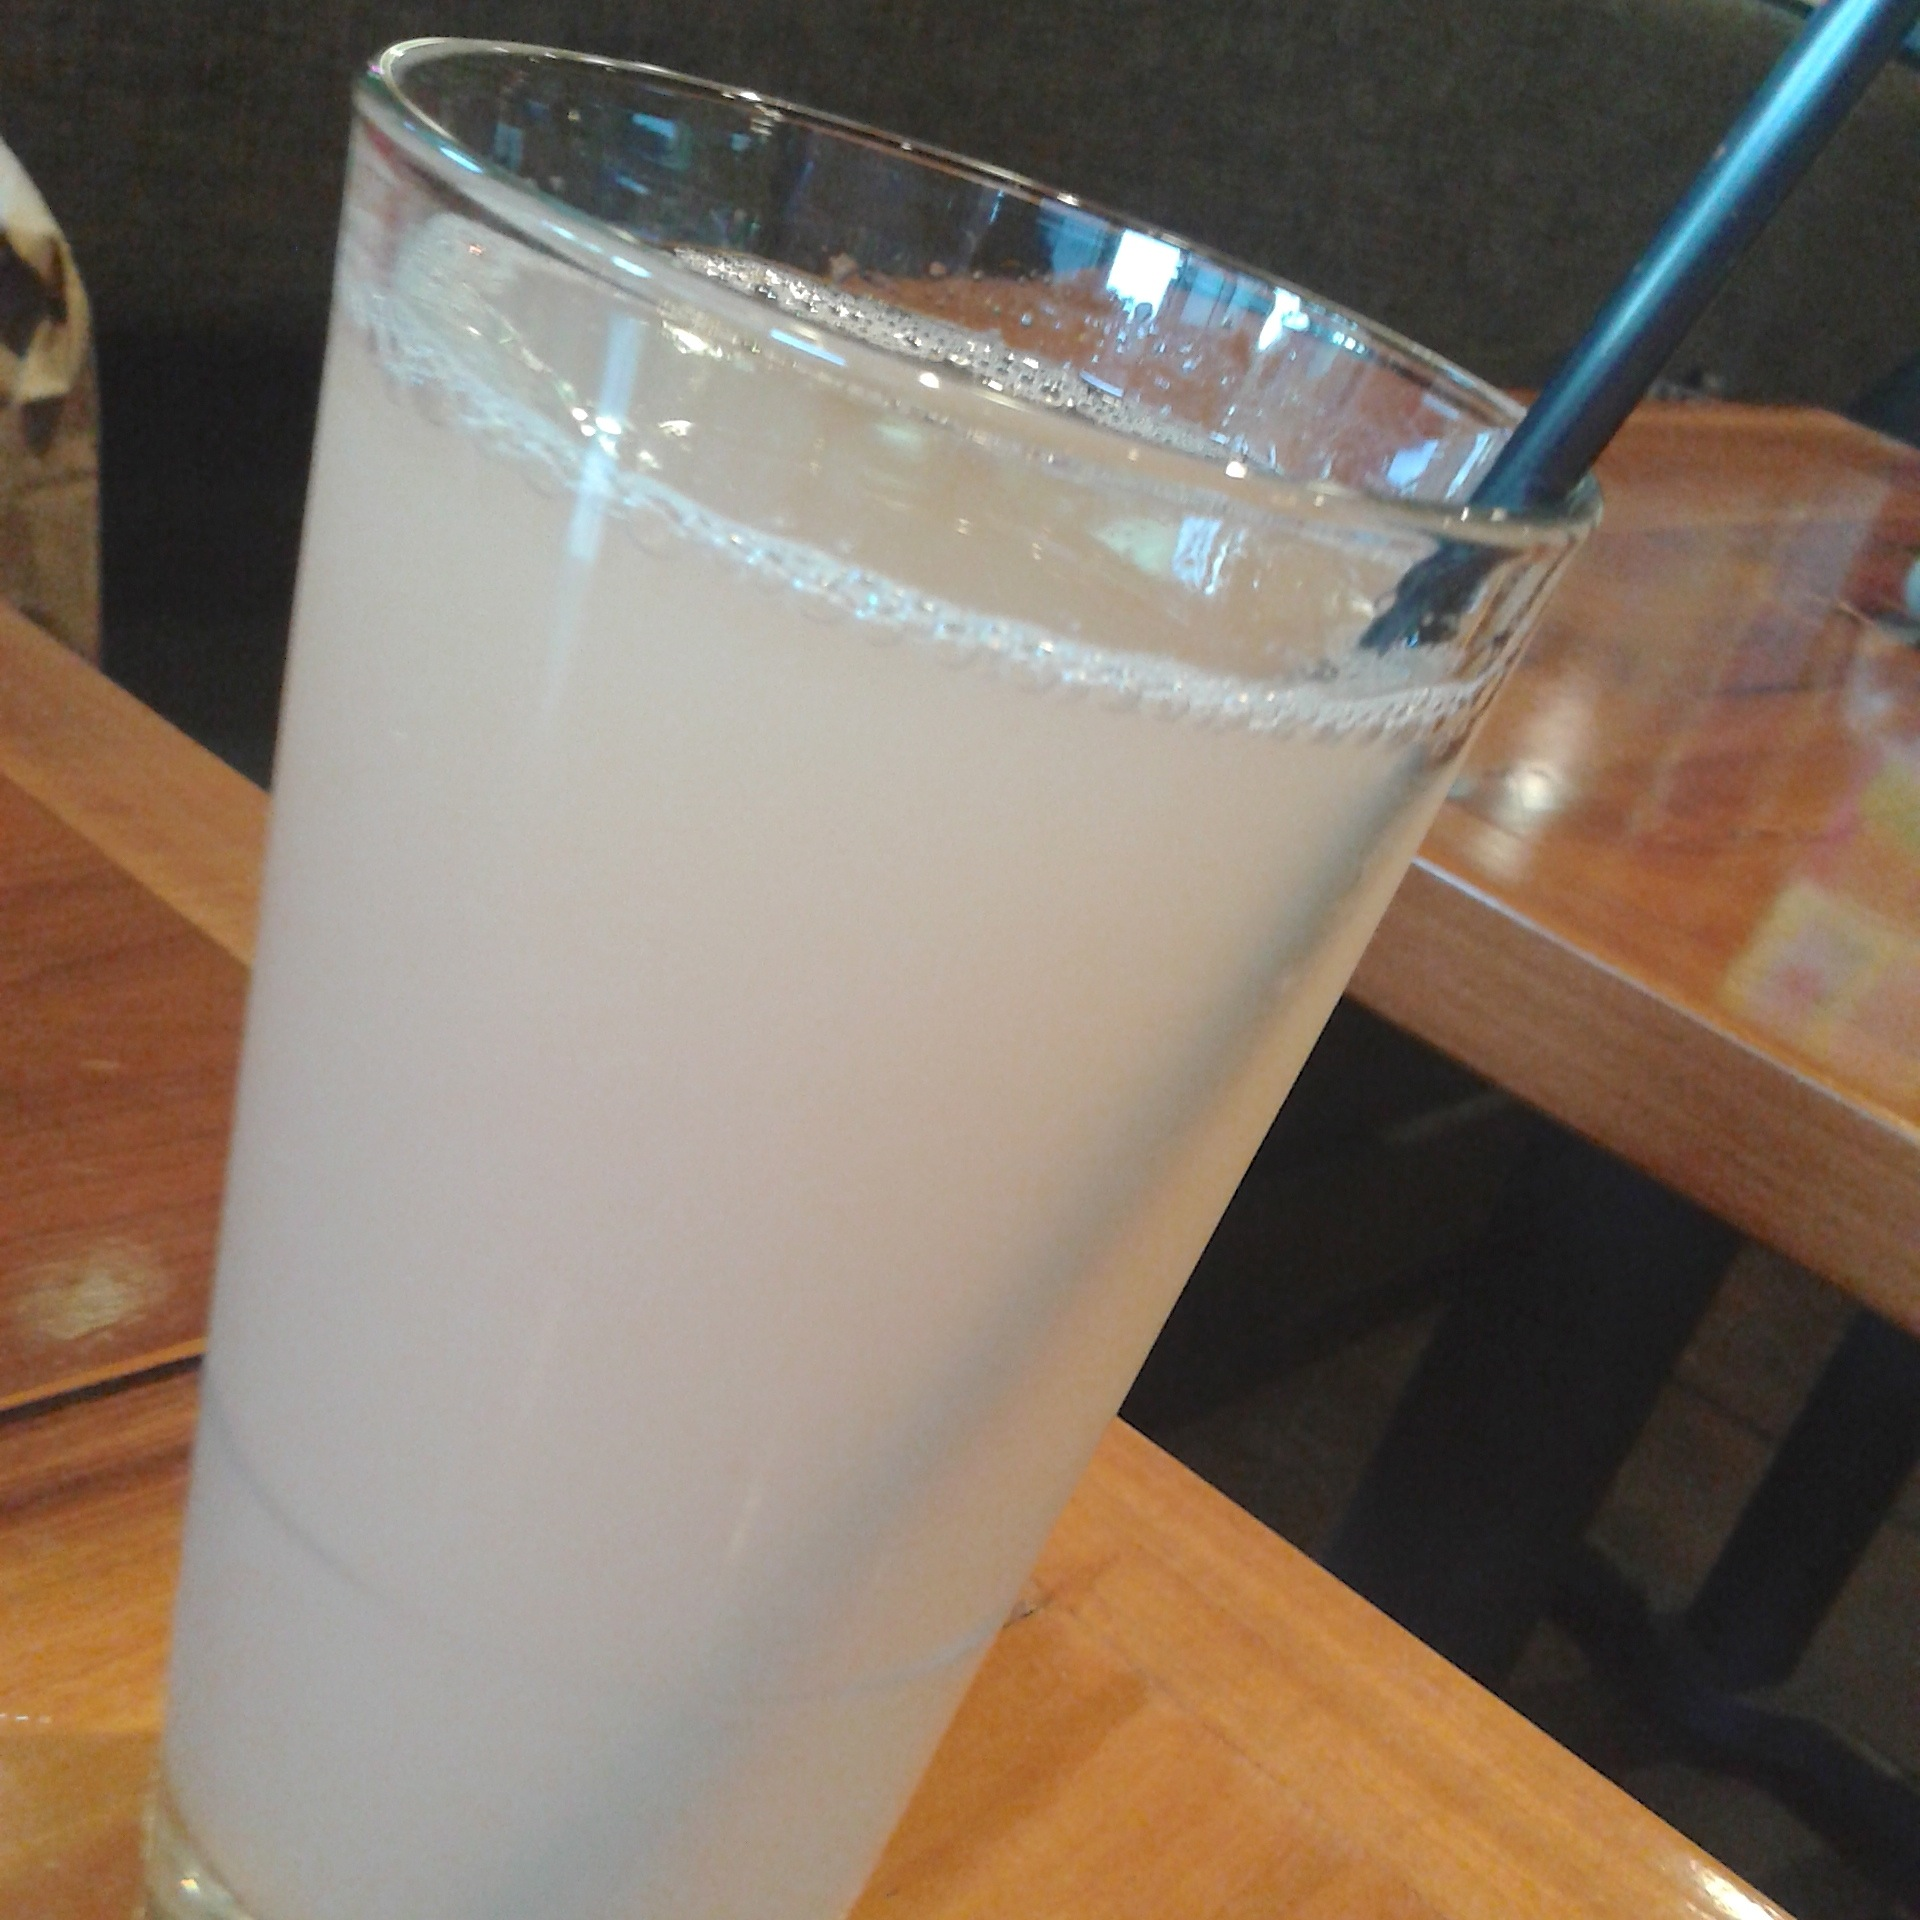 https://i1.wp.com/fatgayvegan.com/wp-content/uploads/2014/05/lavender-lemonade.jpg?fit=1920%2C1920